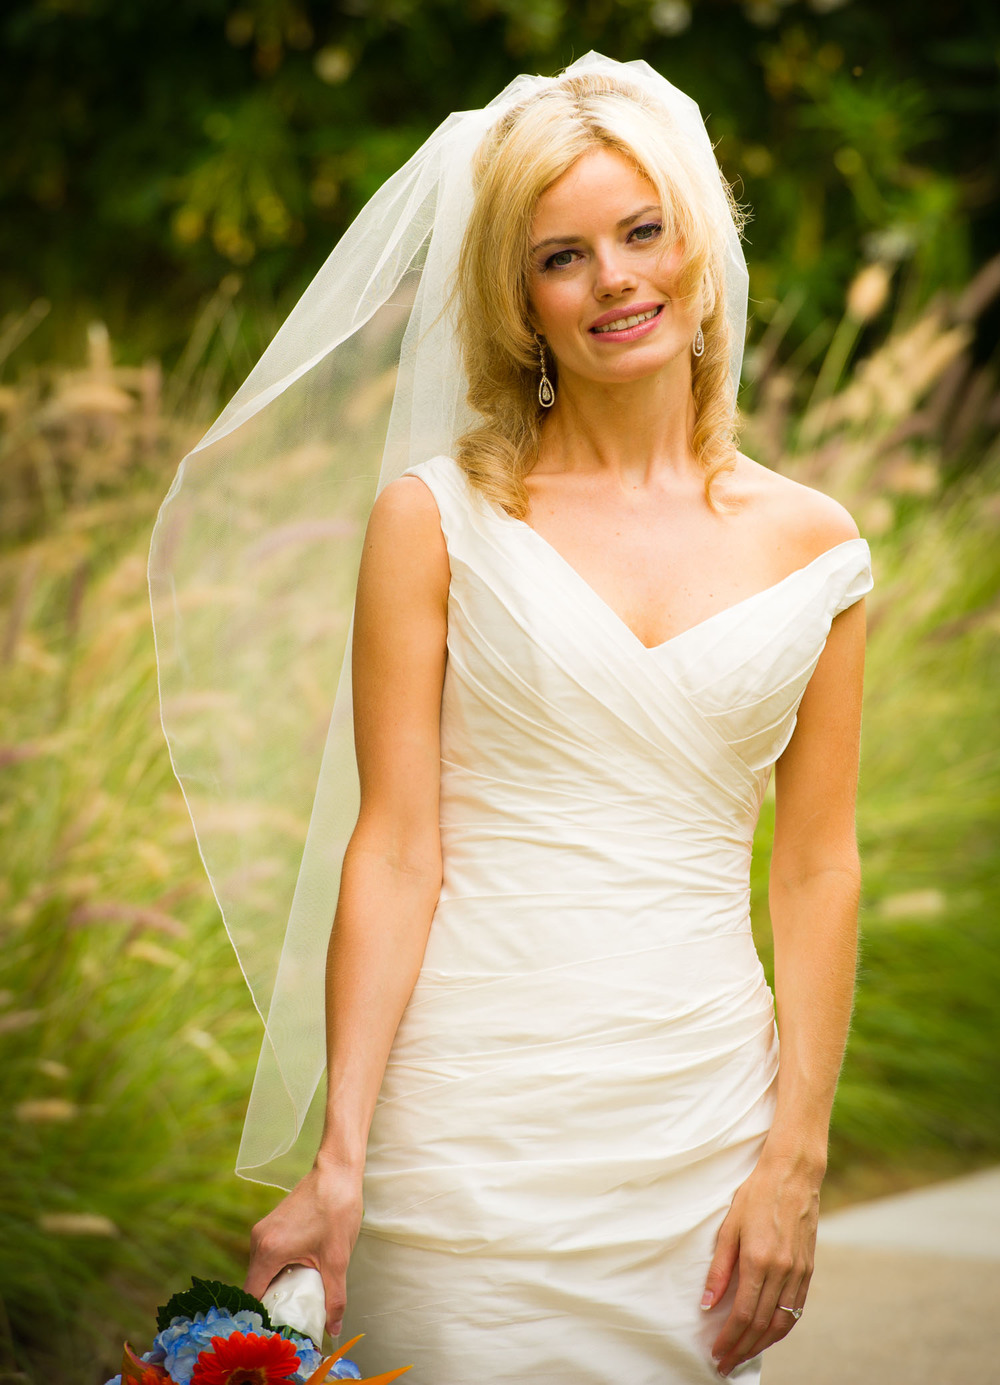 stewart_bertrand_wedding_photography_ejblogwed-1003.jpg